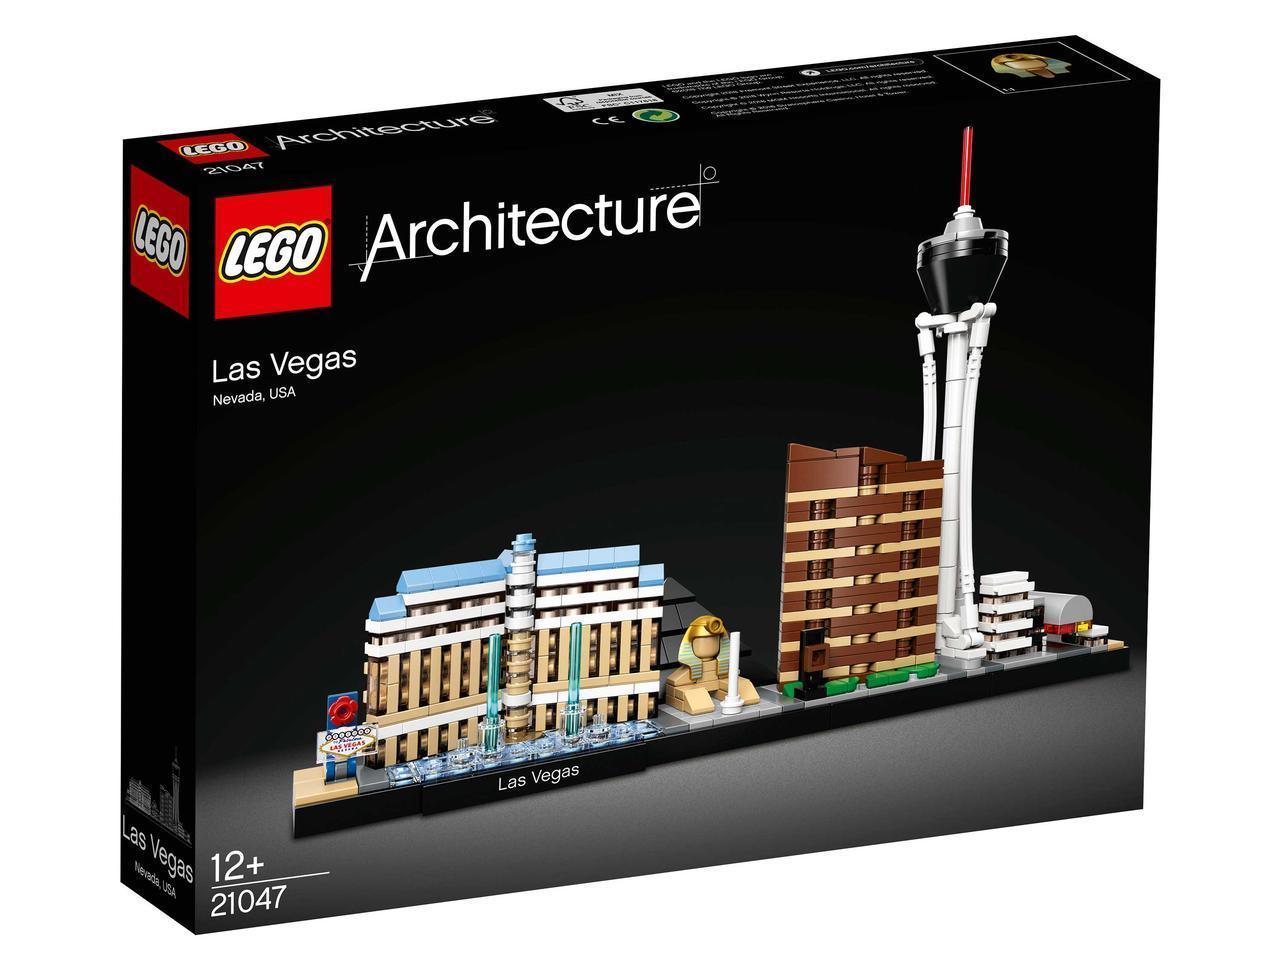 21047 Lego Architecture Лас-Вегас, Лего Архитектура